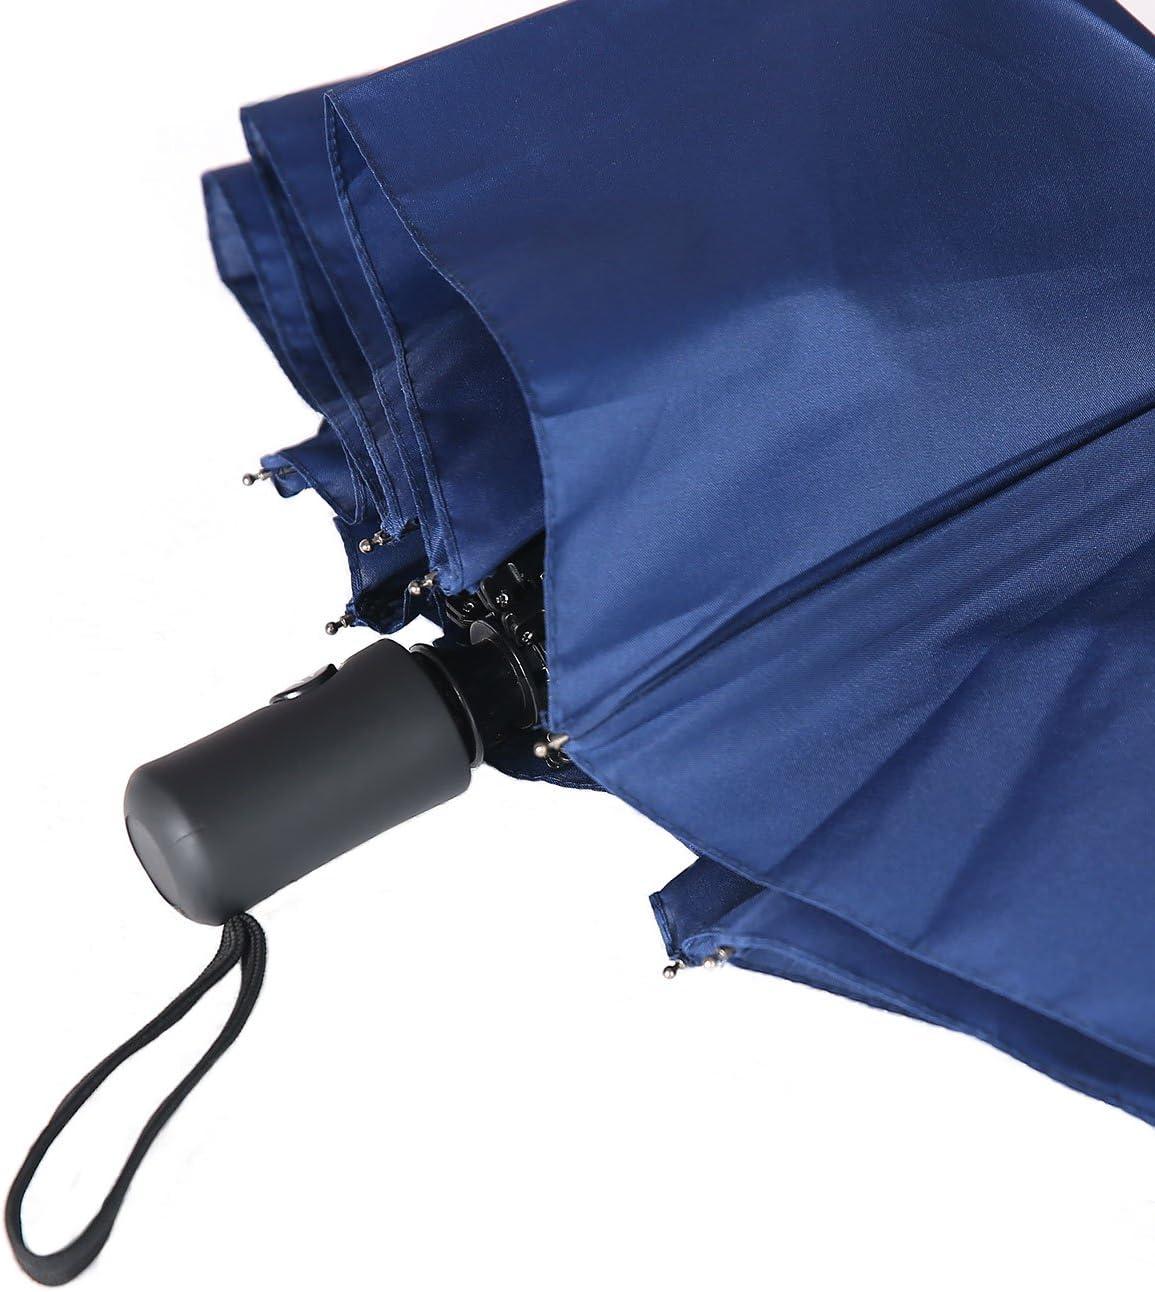 Windproof Compact Light Weight Travel Automatic Open//Close Triple Fold Umbrella